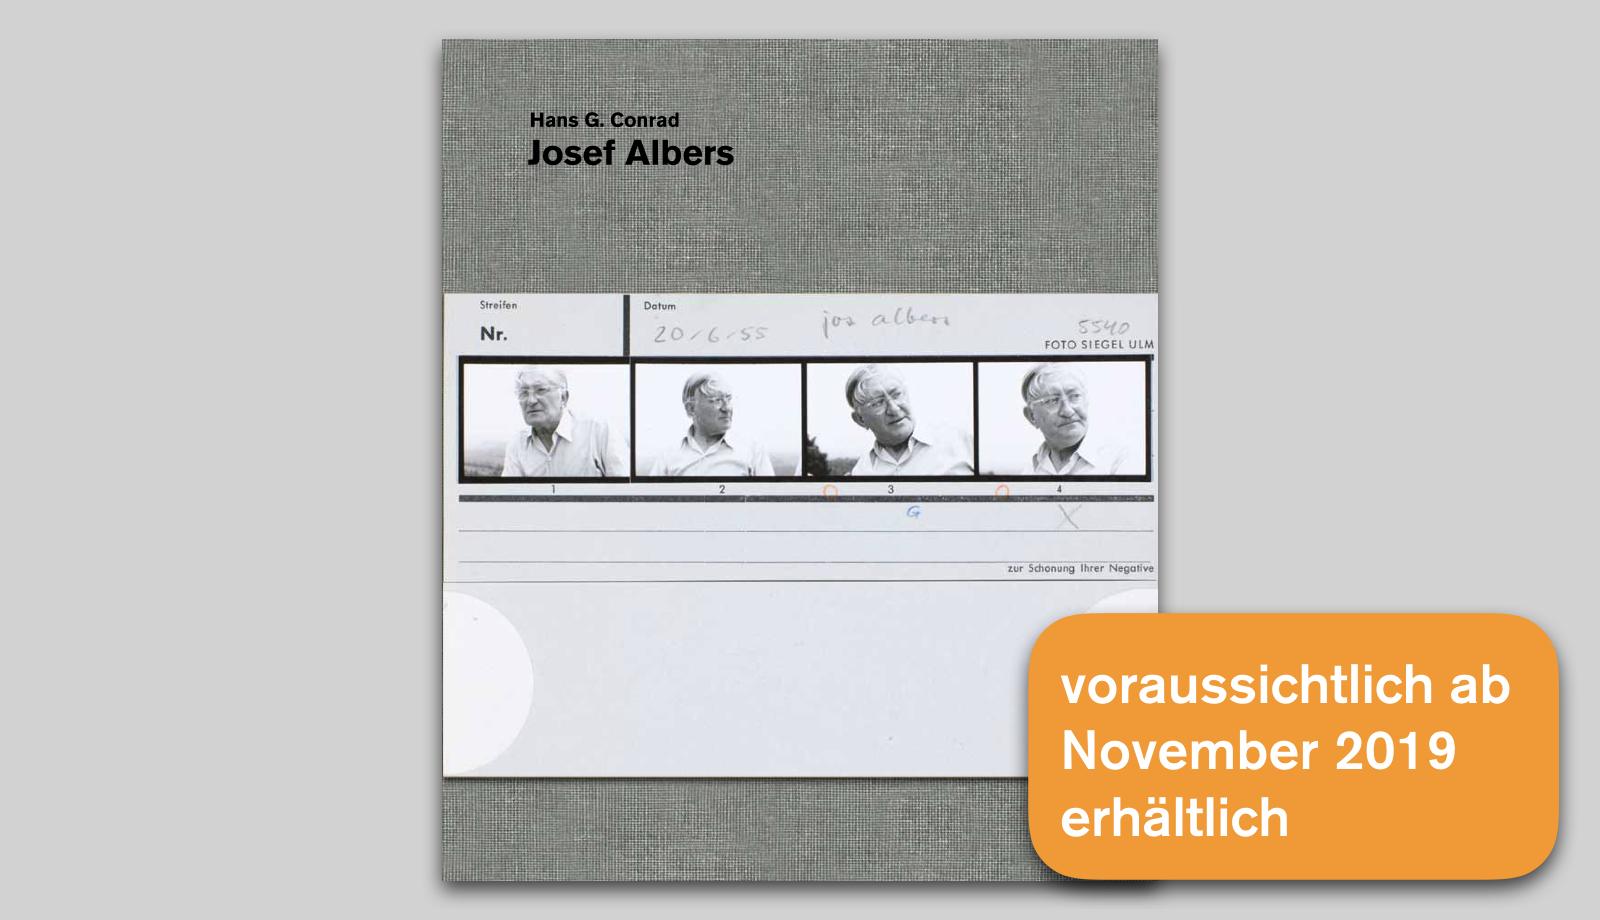 191101_Designtheorie_ReneSpitz_JosefAlbers-Interactions_HfGUlm1953-1955